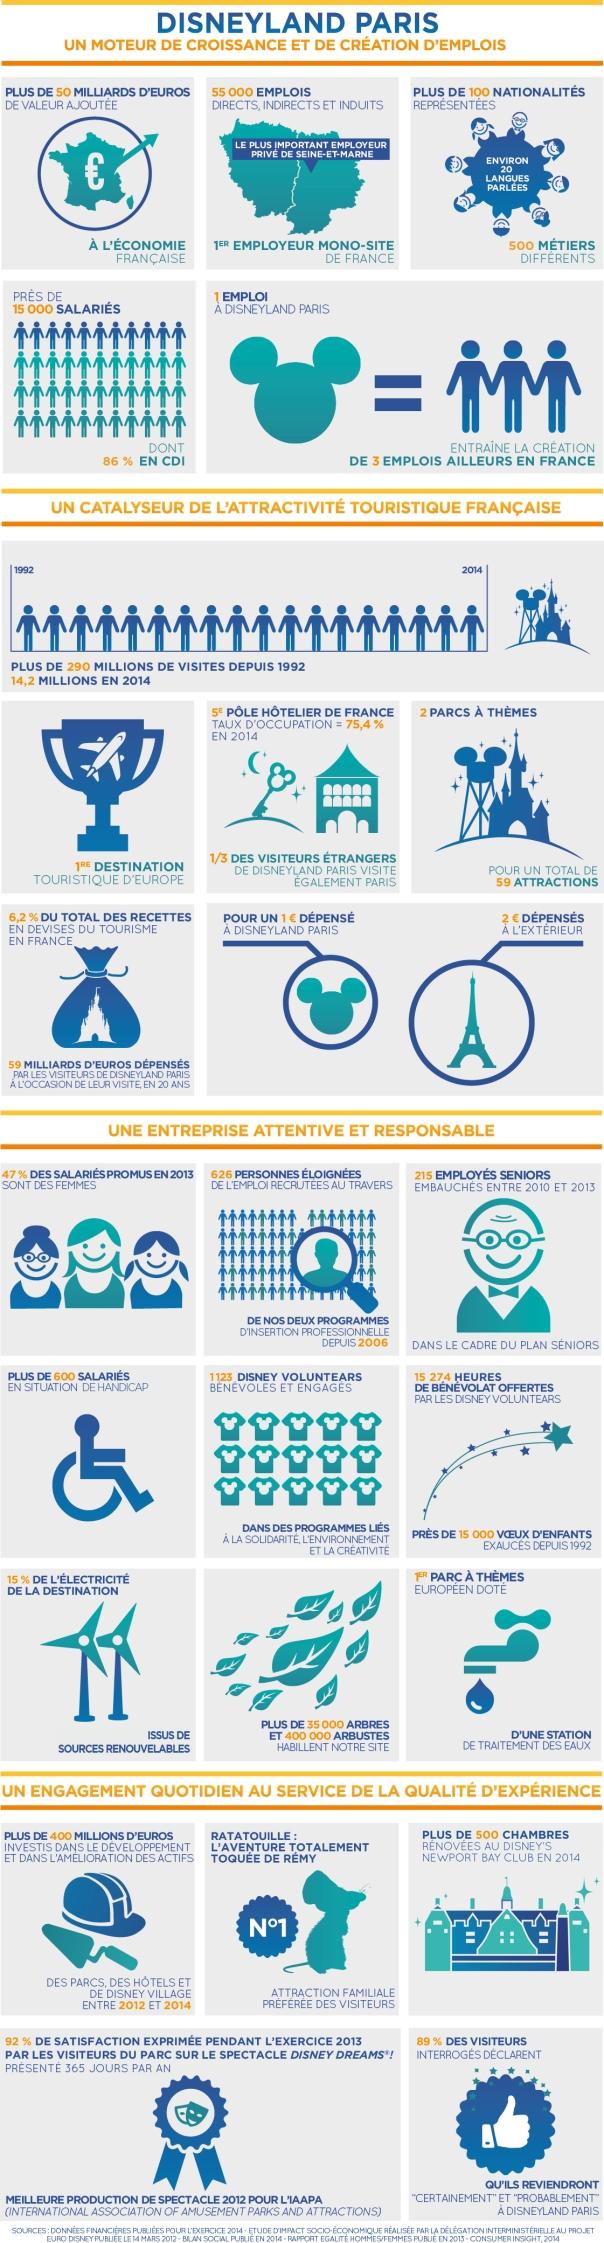 infographie-disney-fr